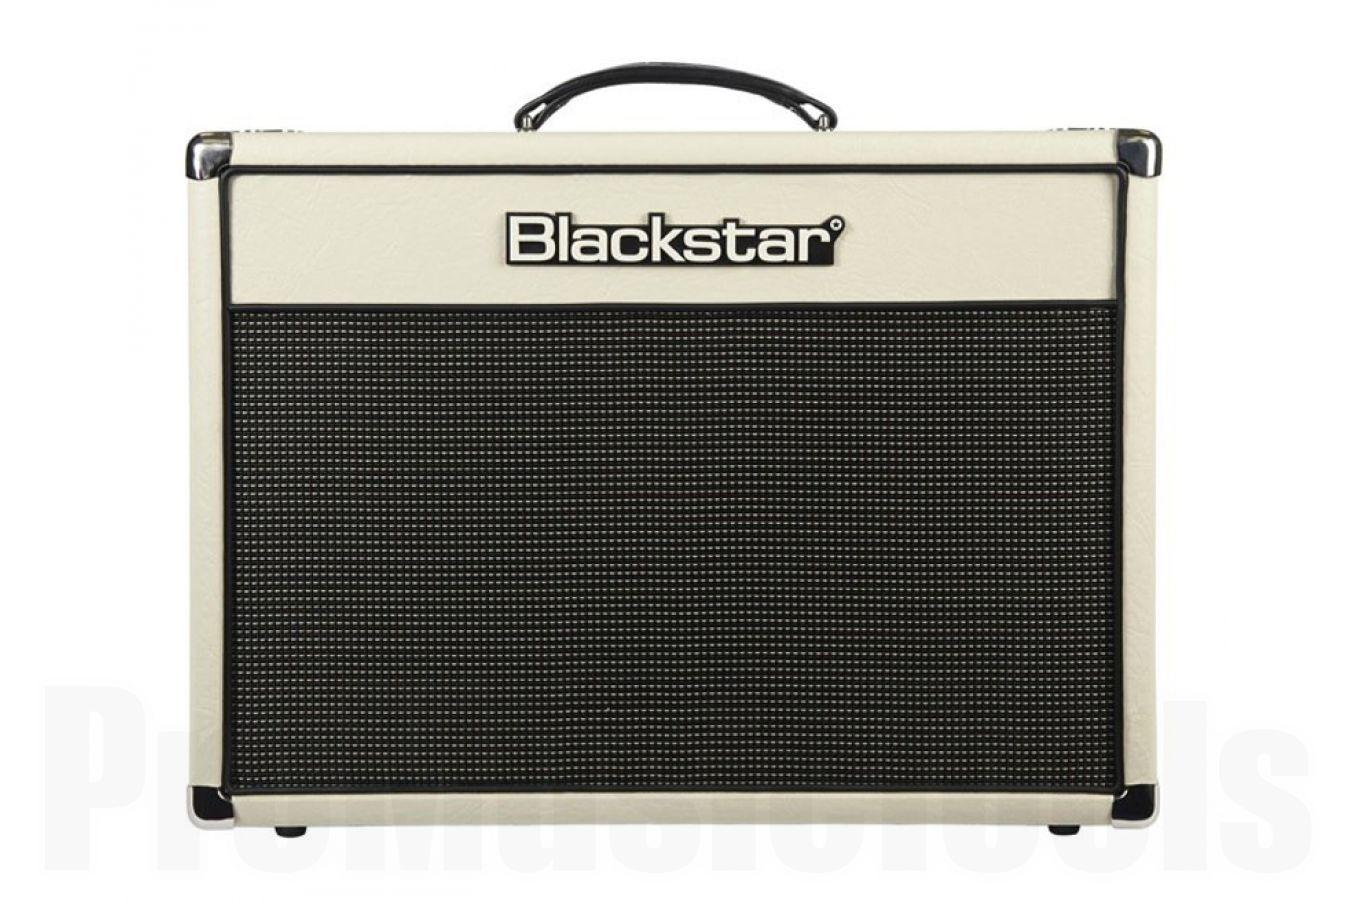 Blackstar HT-5TH 2x10 Combo - Anniversary Limited Edition